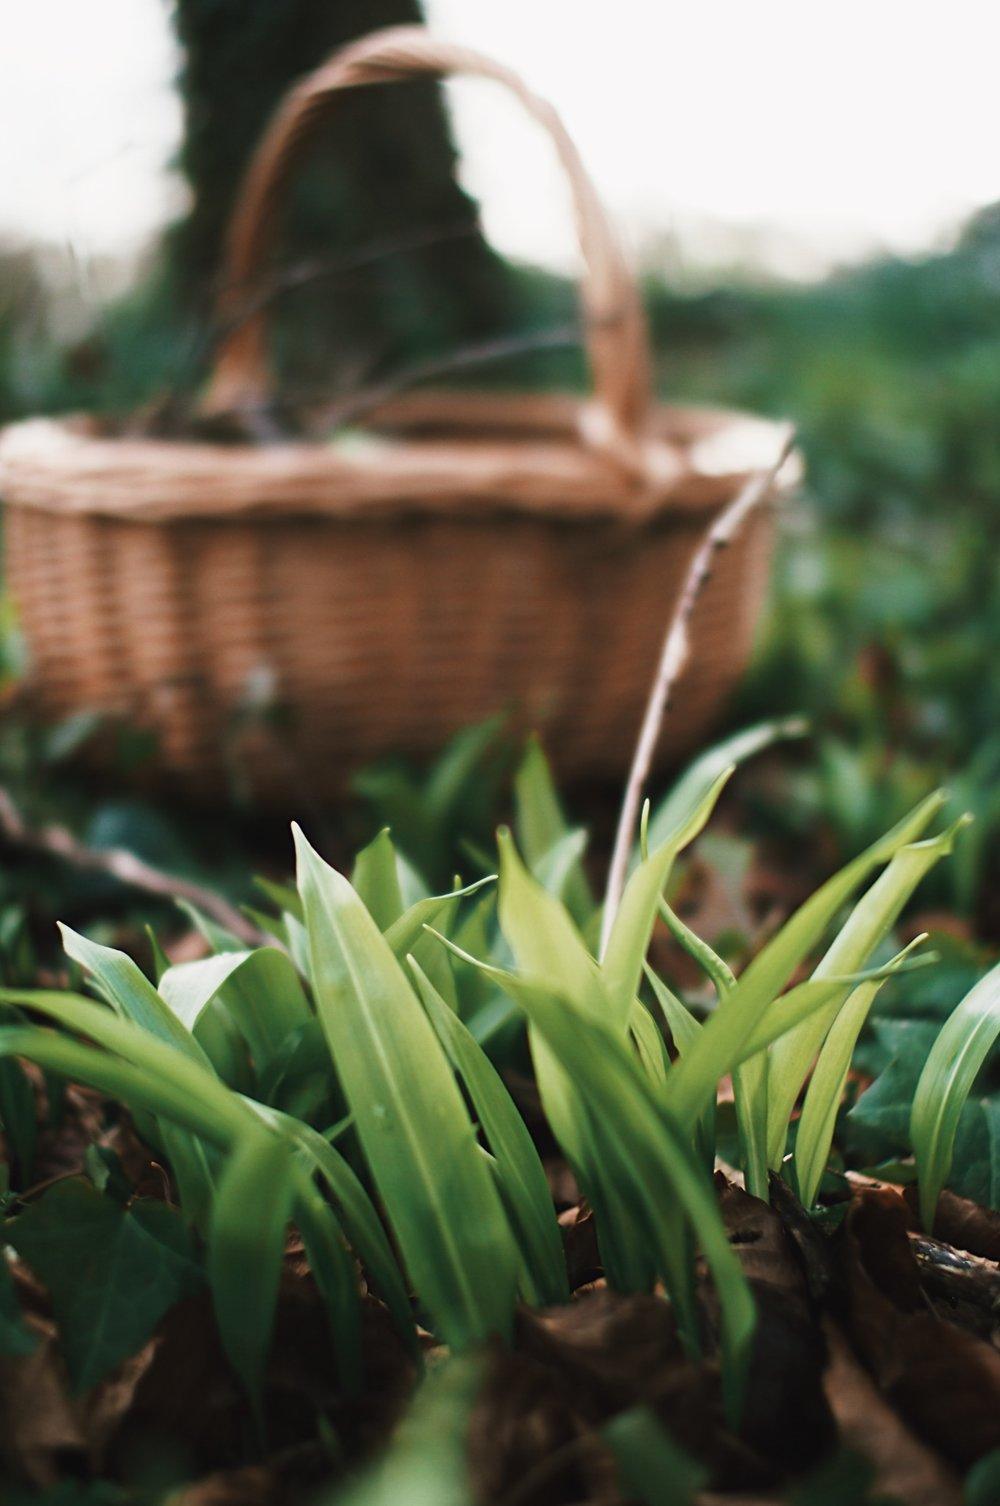 edible-wild-spring-greens-wild-garlic